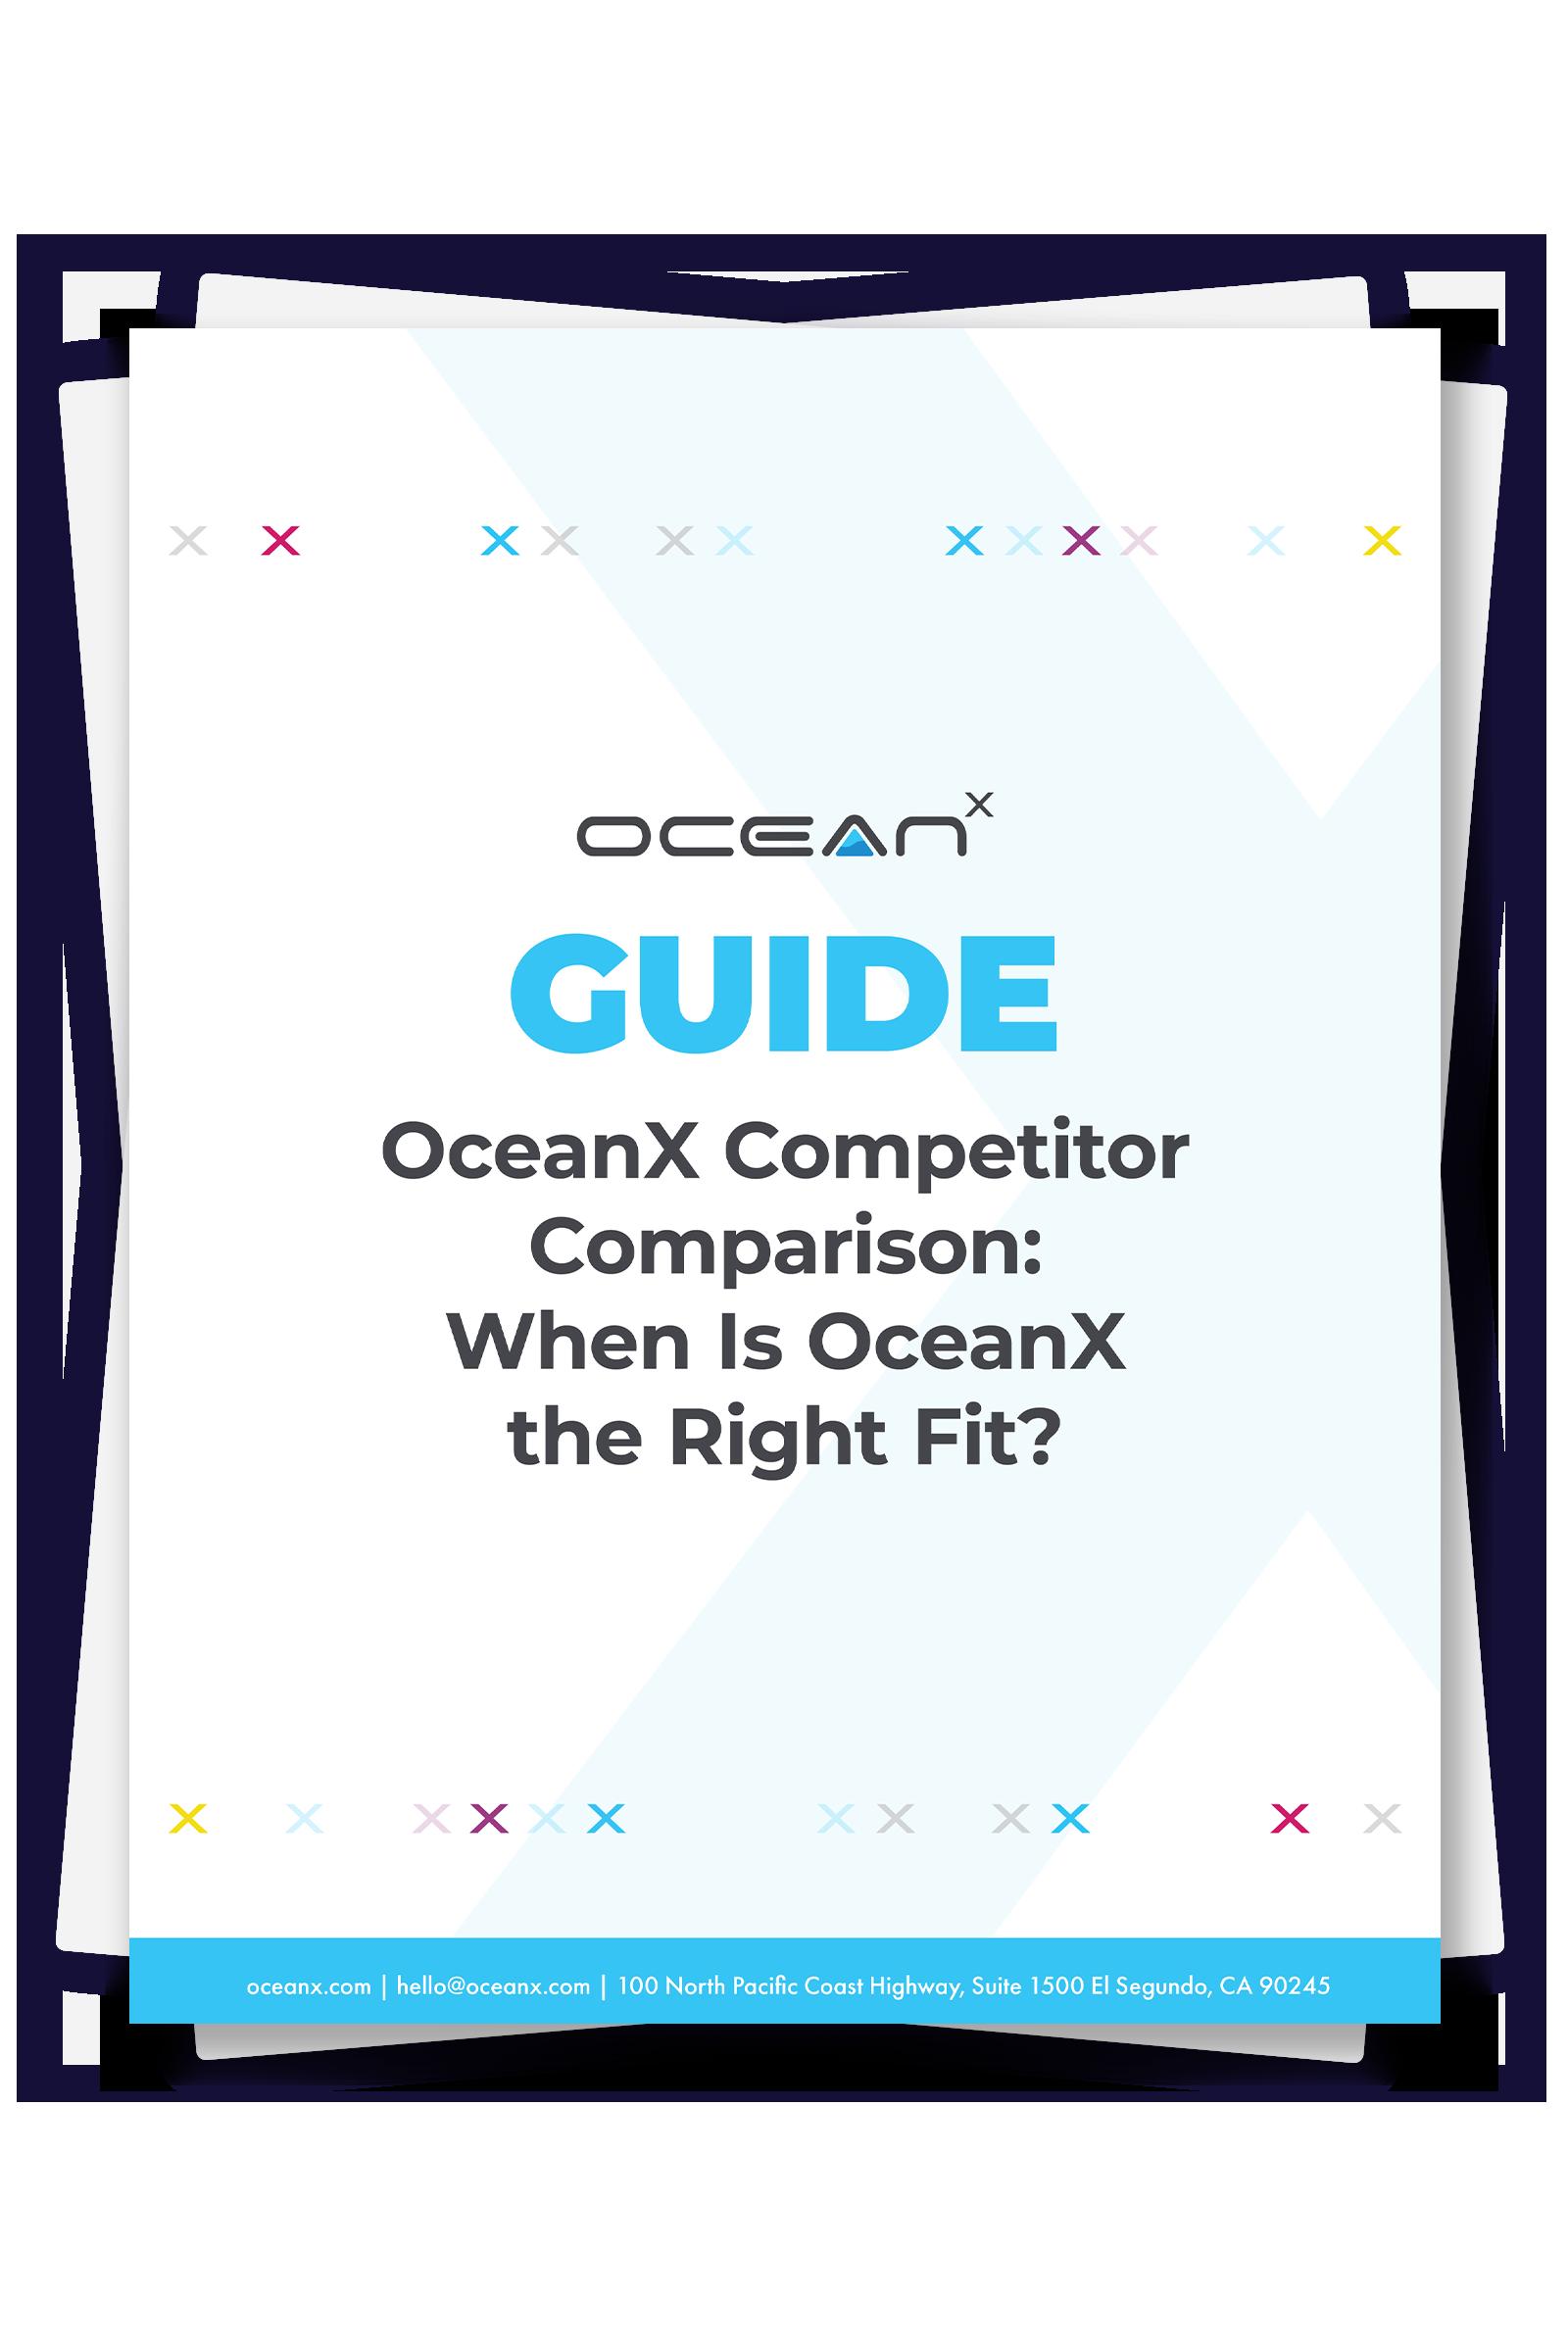 1084714_CaseStudyResourcePDFCoverImage(OceanXCompetitorComparisonWhenIsOceanXtheRightFit?)_02_060821